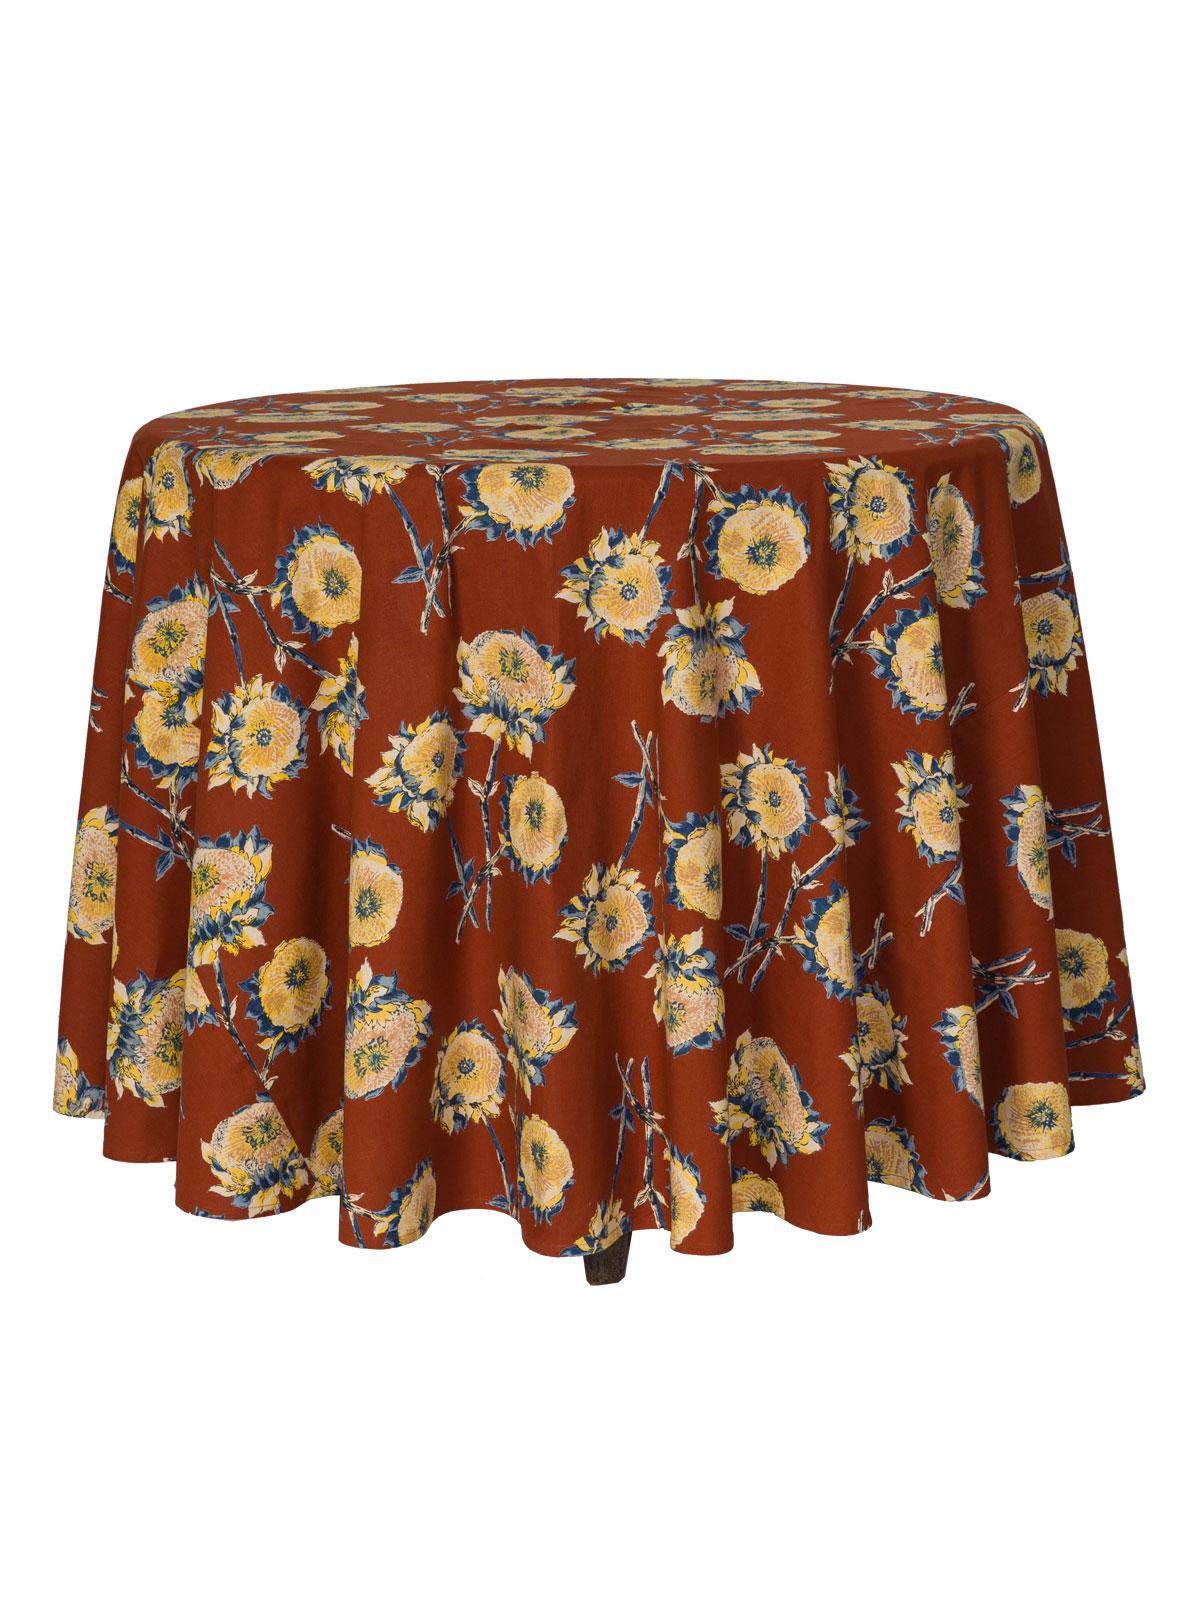 Sun Follower Round Tablecloth - Rust